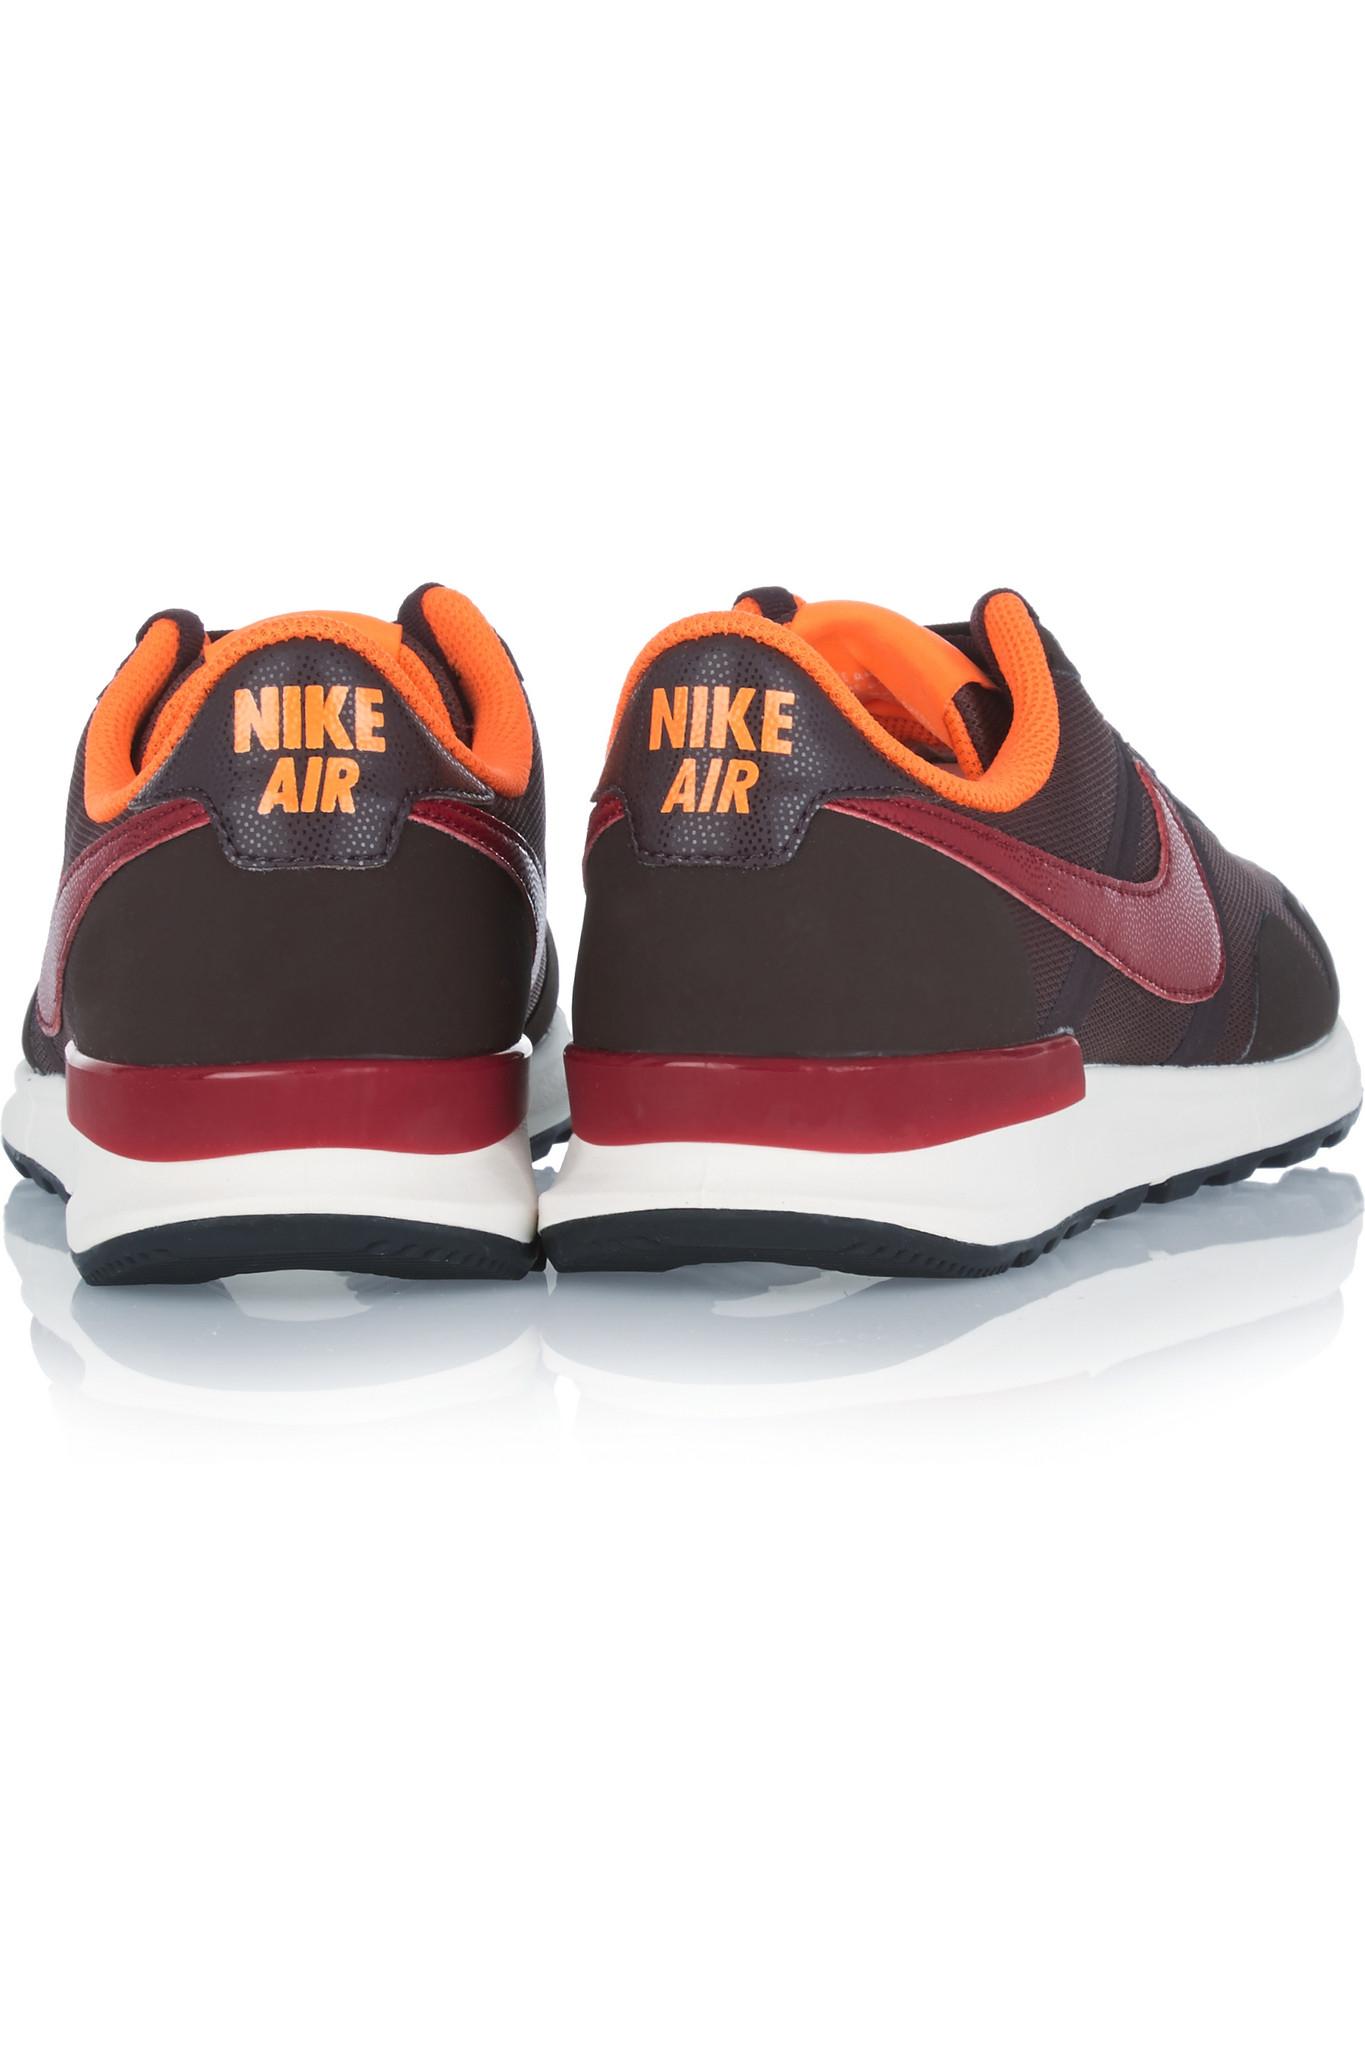 Nike Air Pegasus 83/30 Mesh, Rubber And Leather Sneakers in Burgundy (Purple)